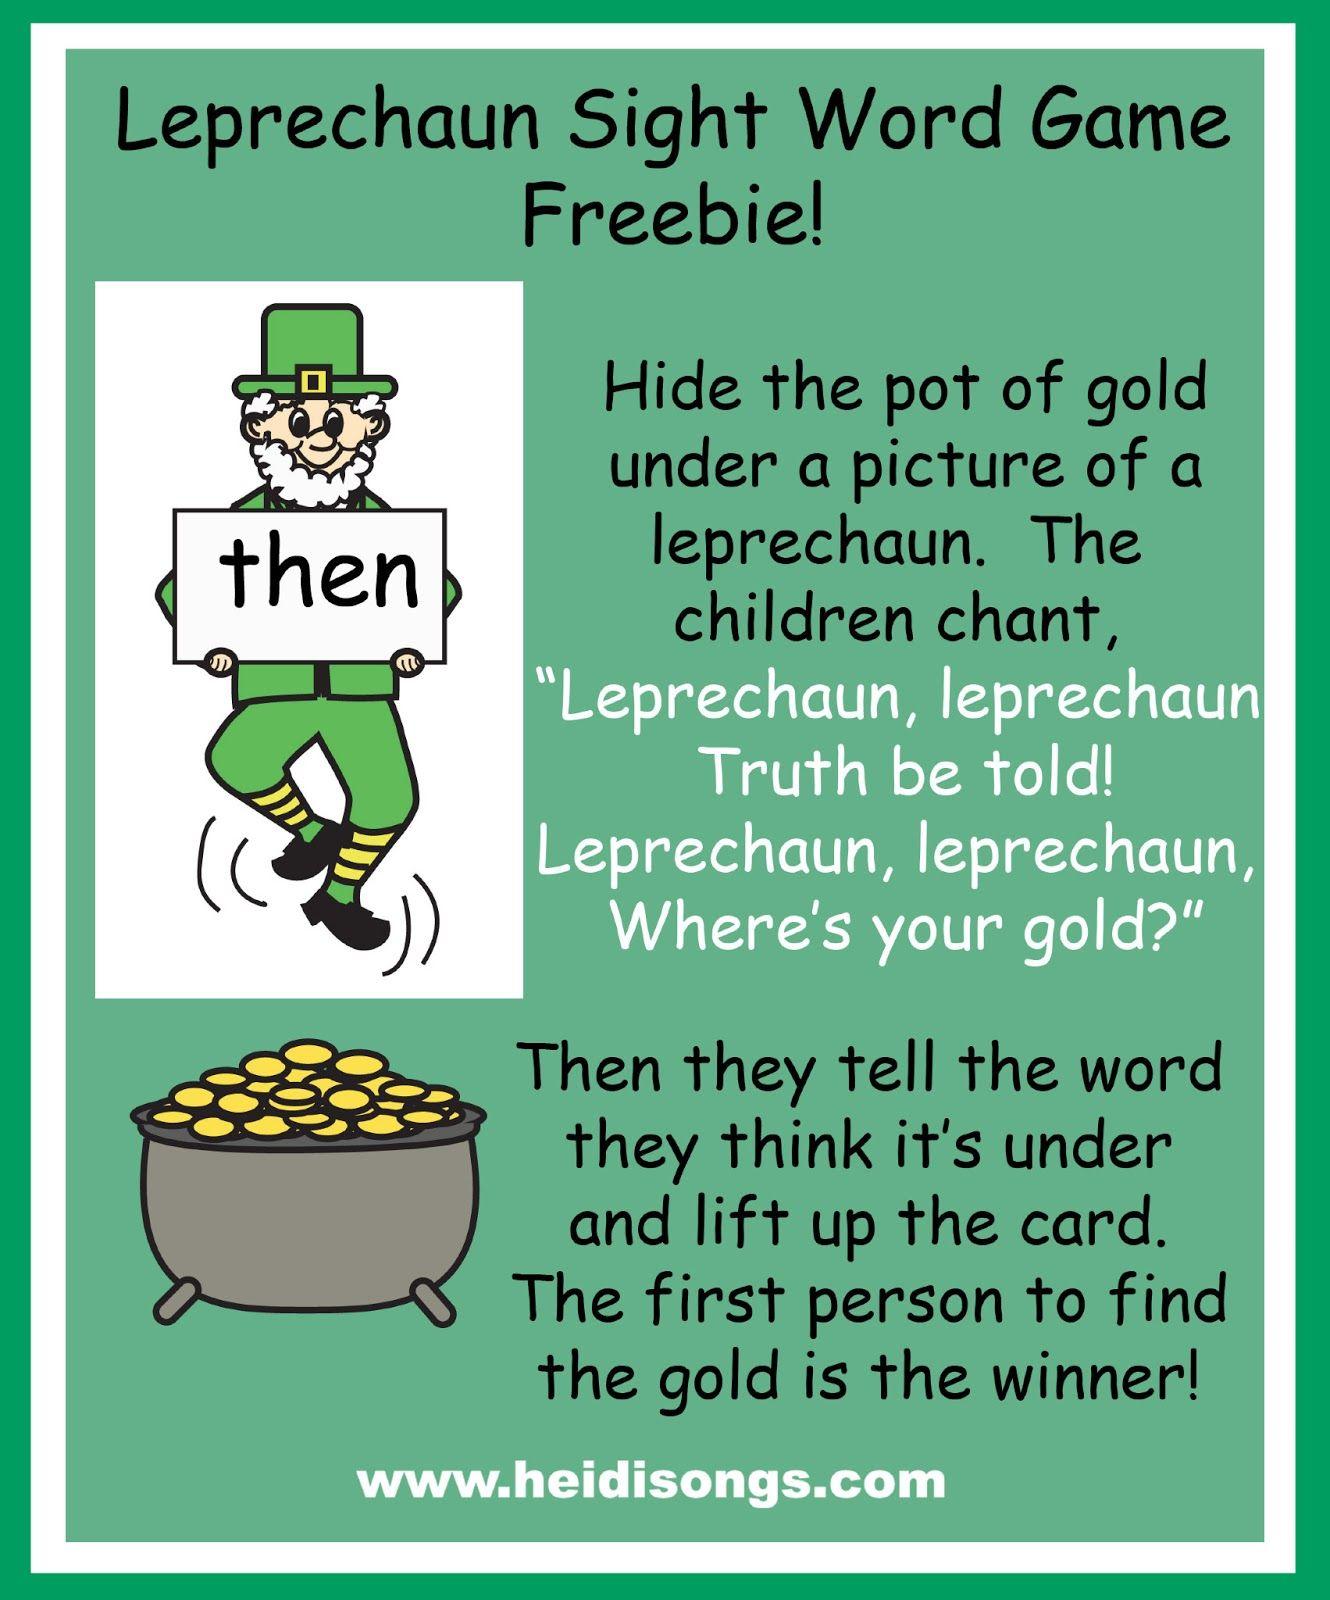 Heidisongs Resource Leprechaun Sight Word Game Freebie